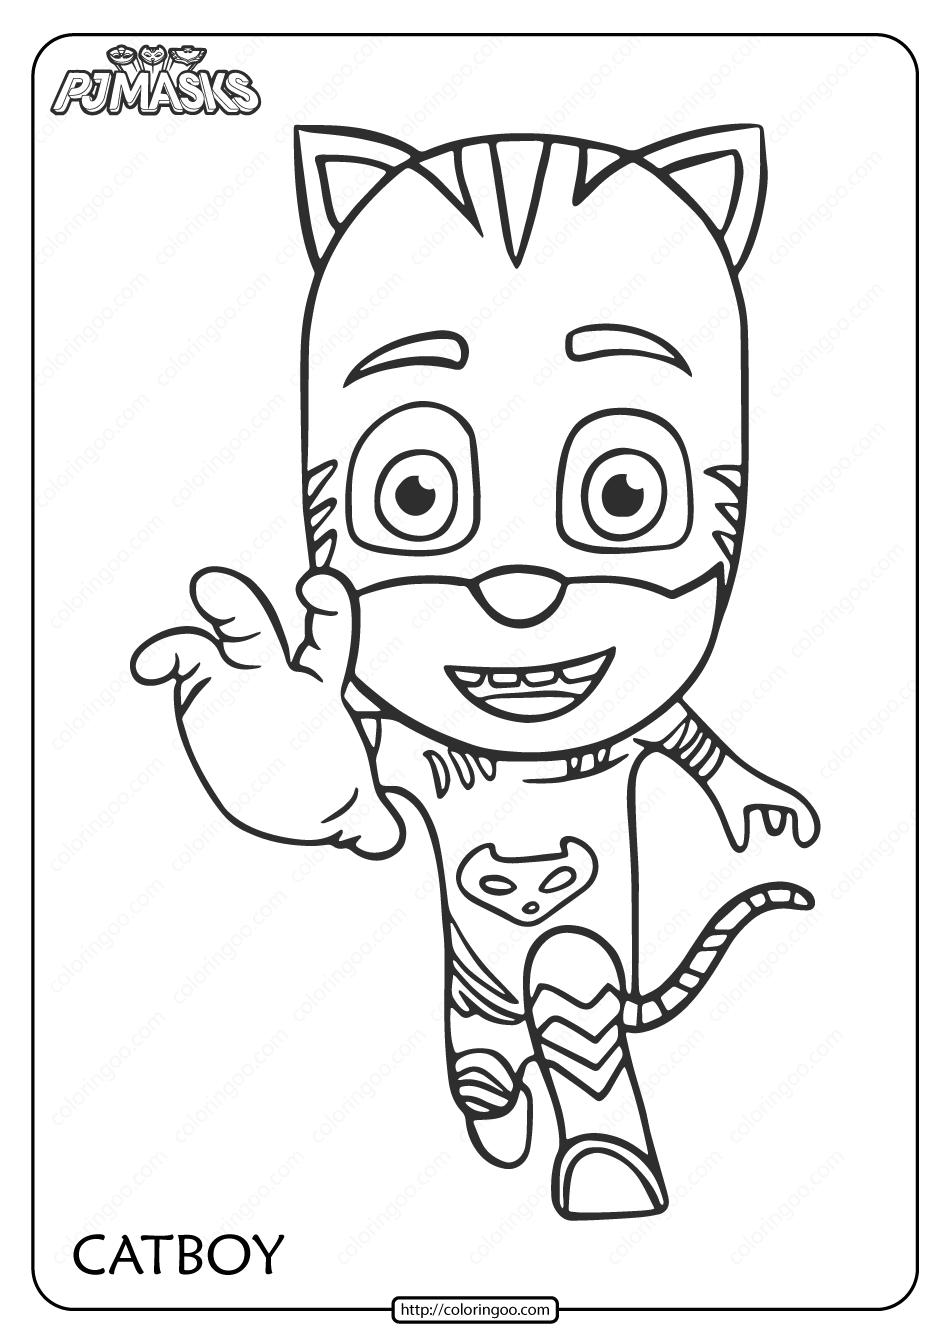 Free Printable PJ Masks Catboy Pdf Coloring Page